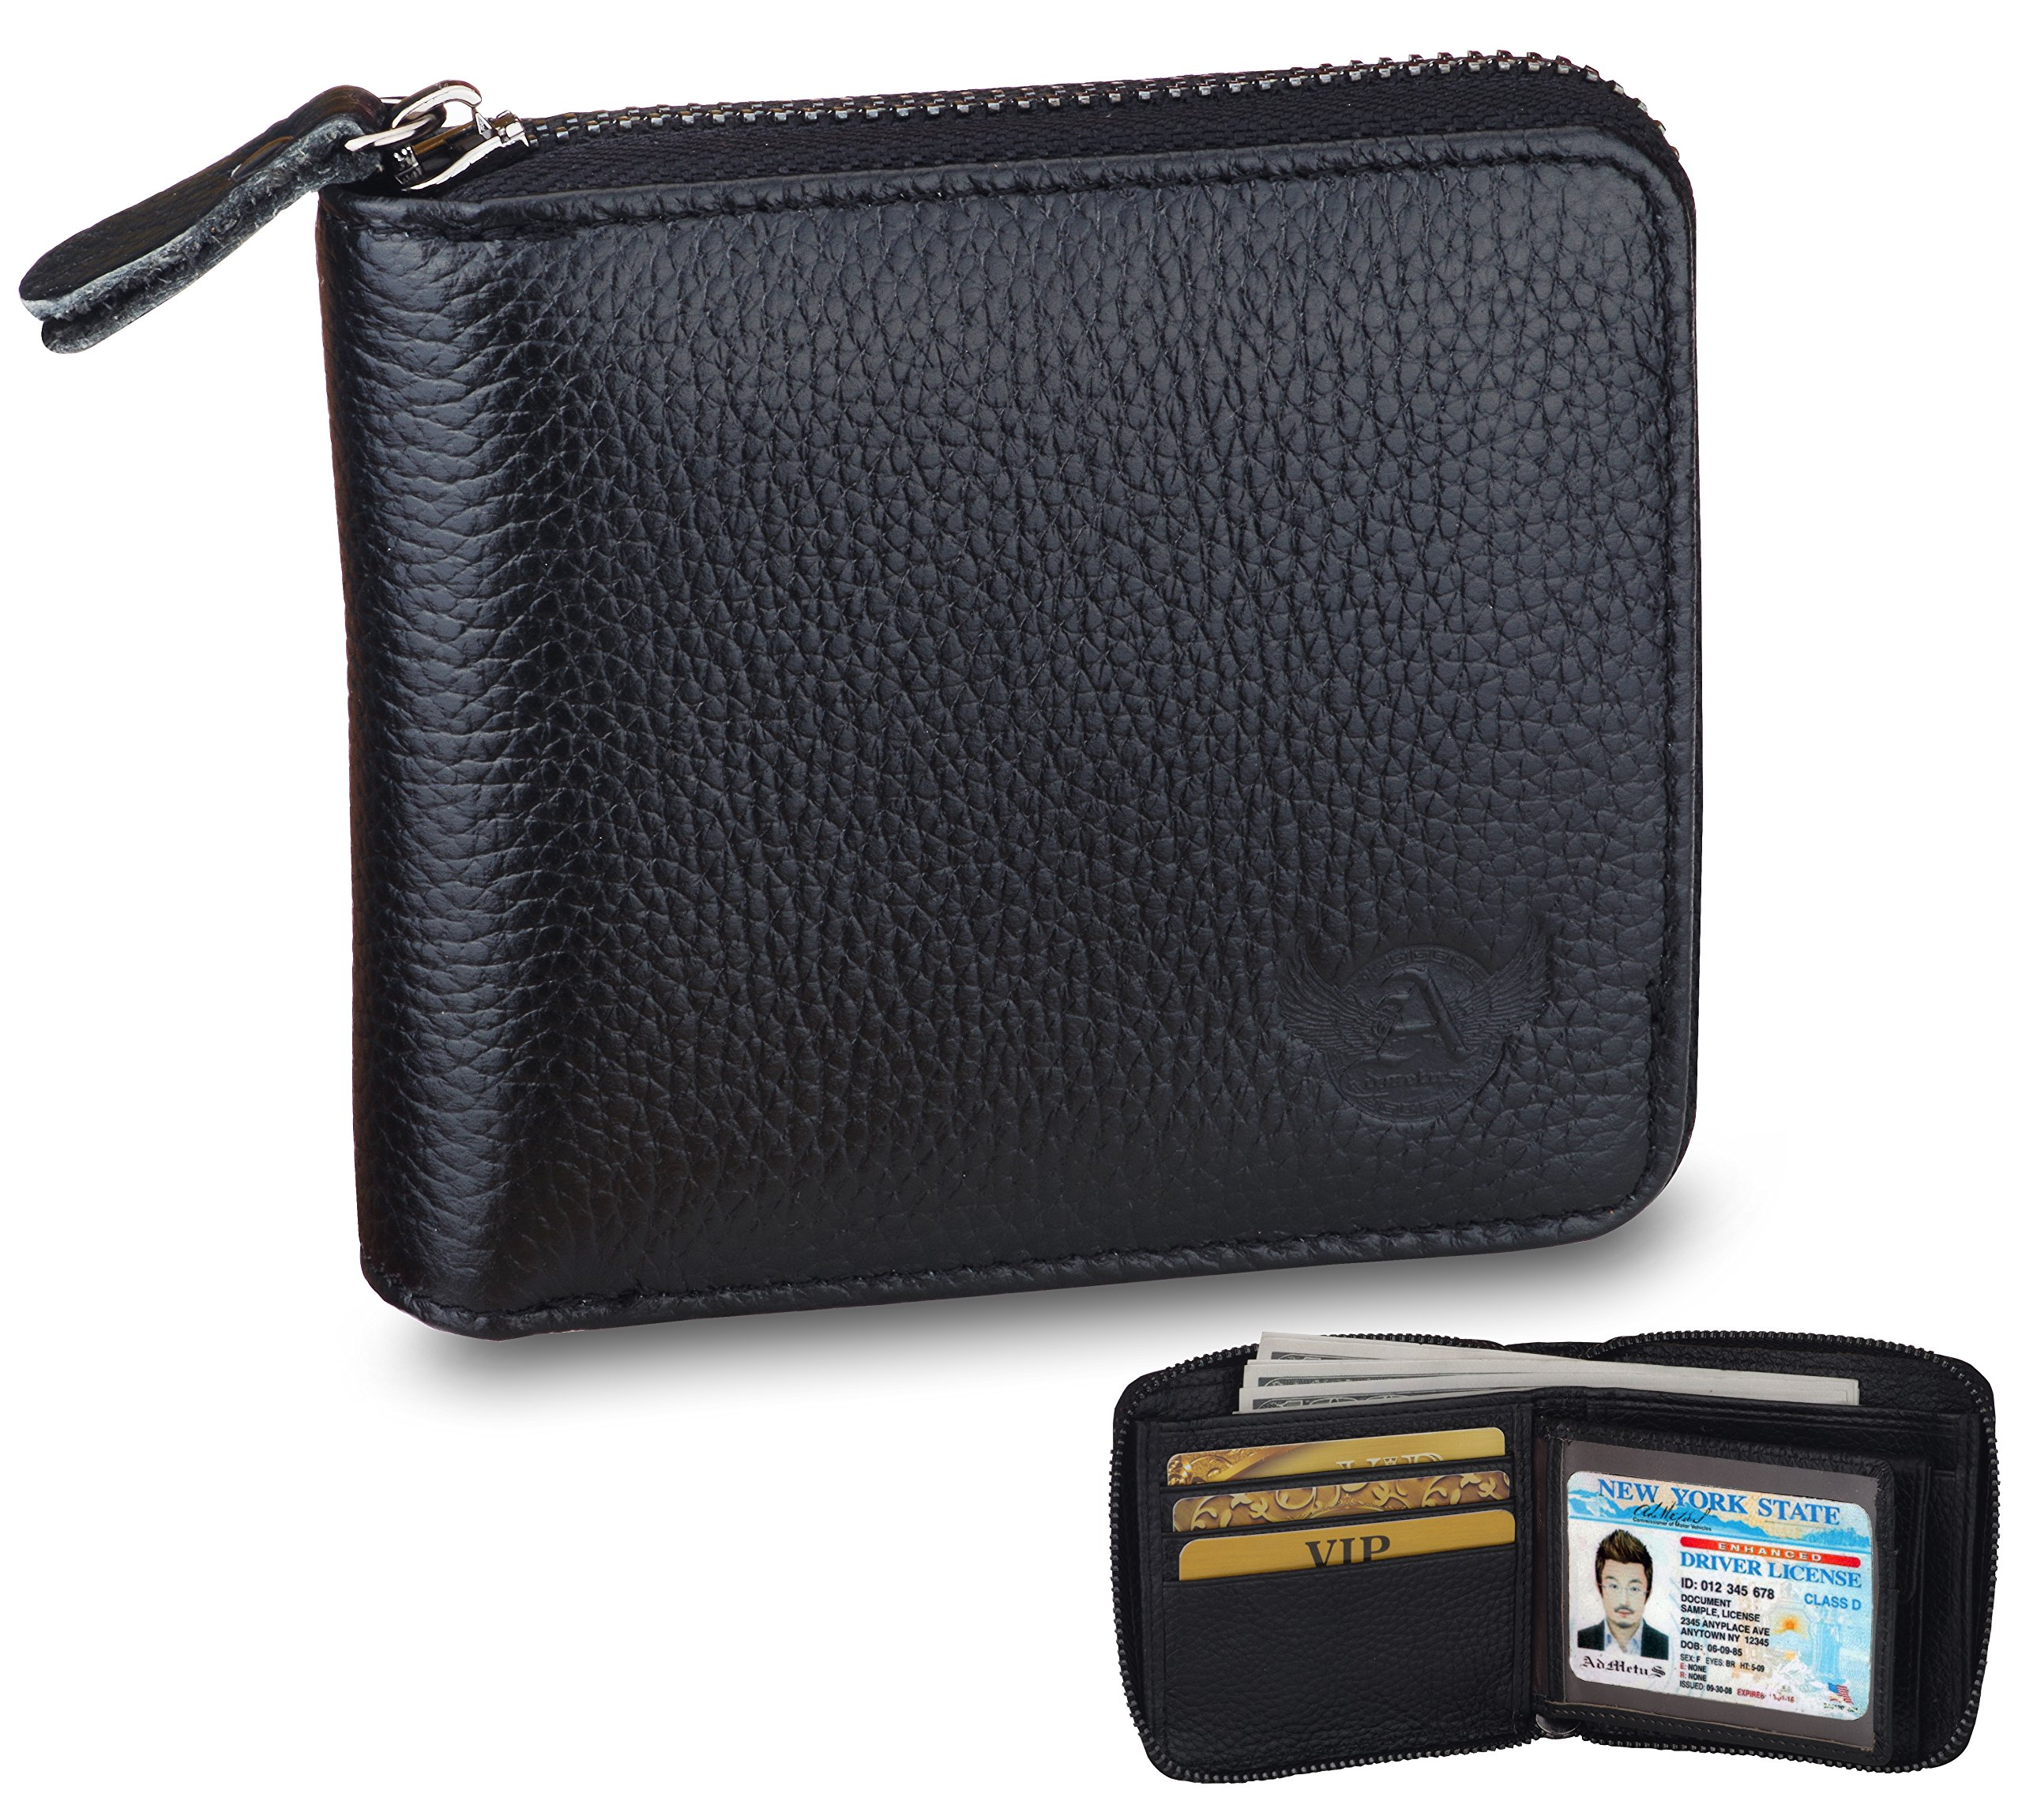 Men's Genuine Leather Bifold Wallet Zip-Around Card Holder Money Clip-Gift Wrapped Black 5